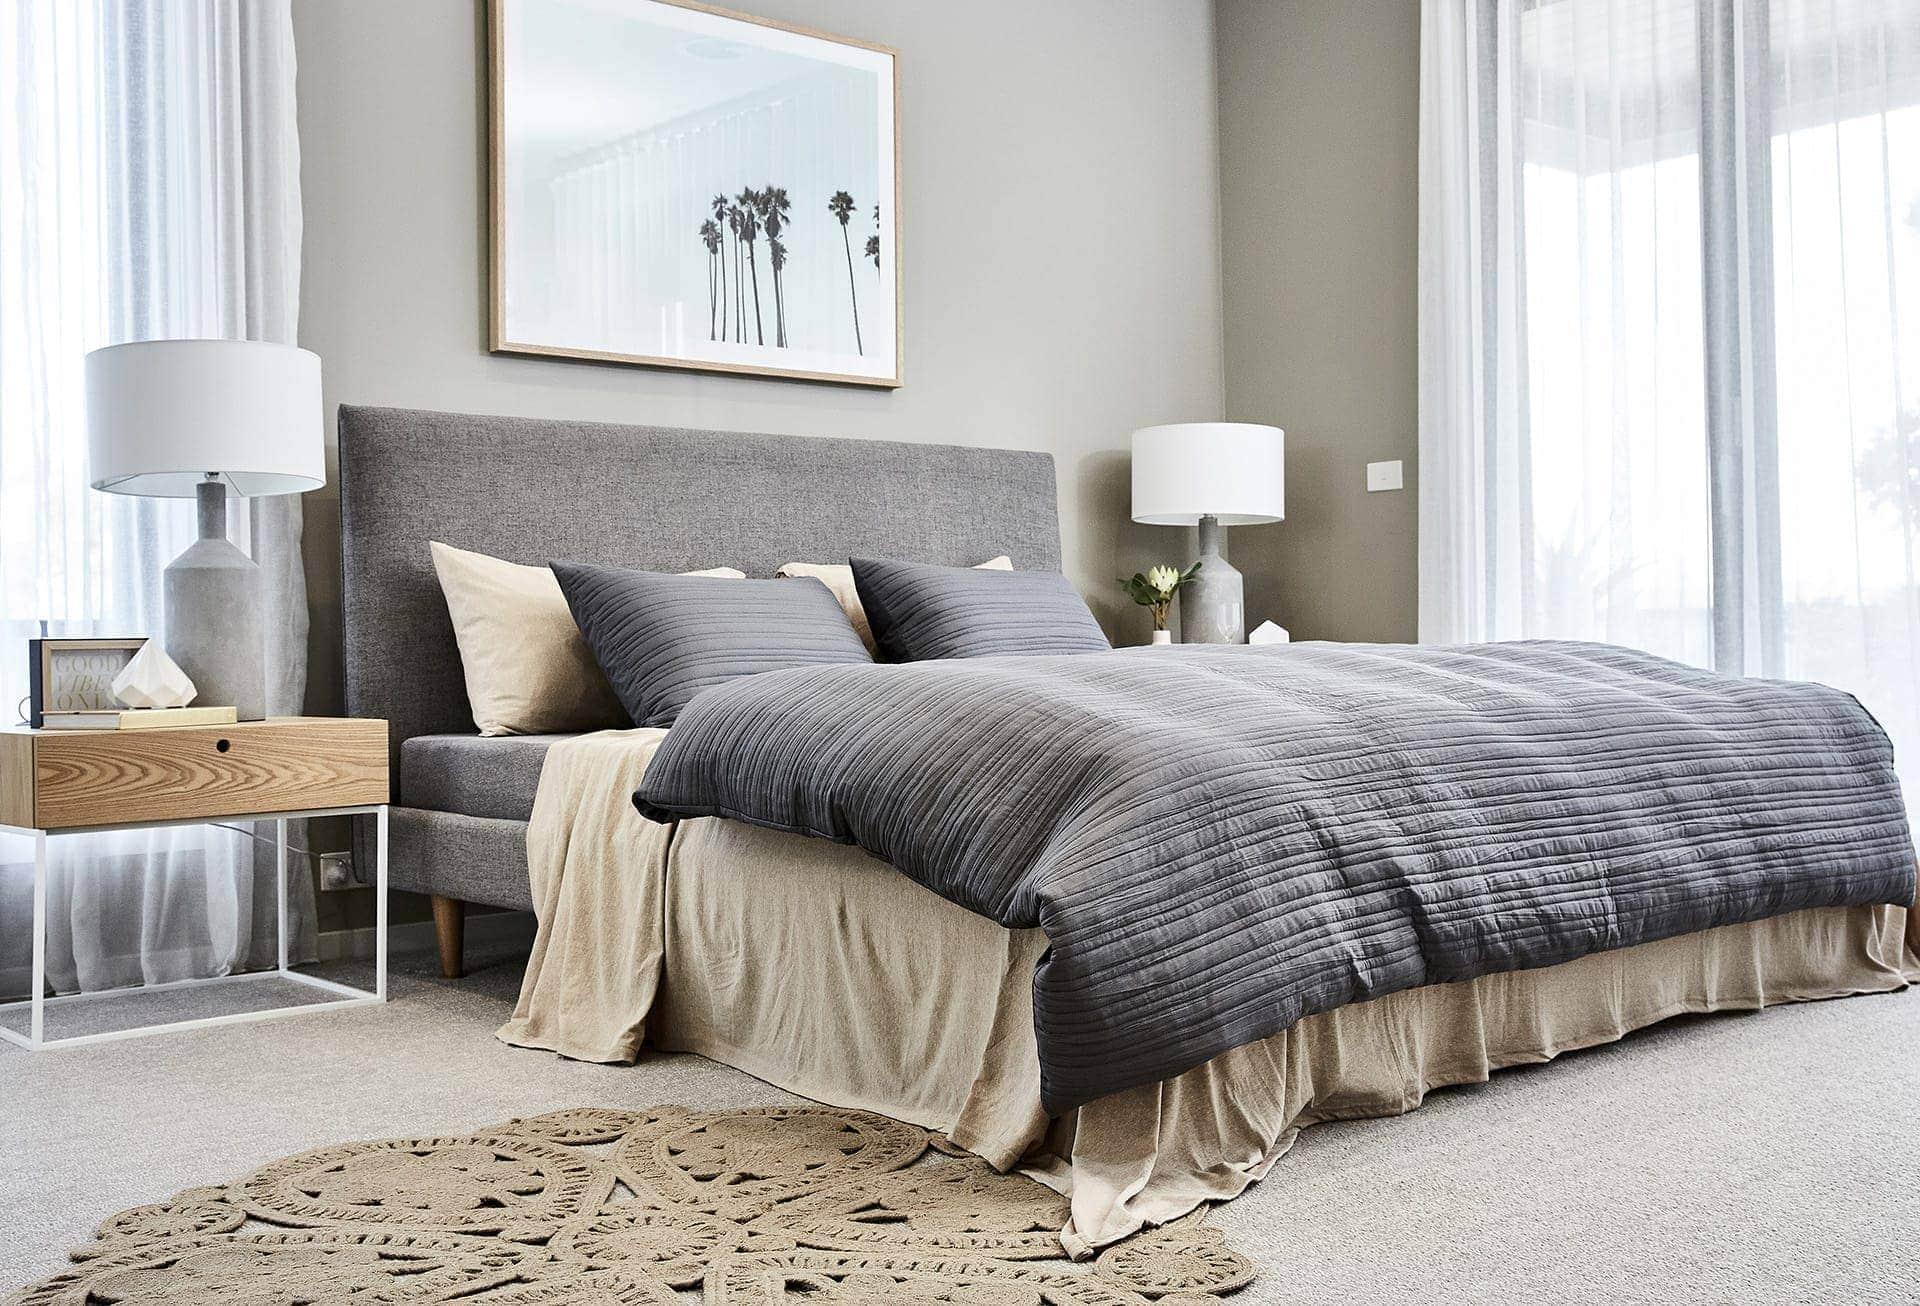 jersey sheet set from lorraine lea in grey and beige bedroom